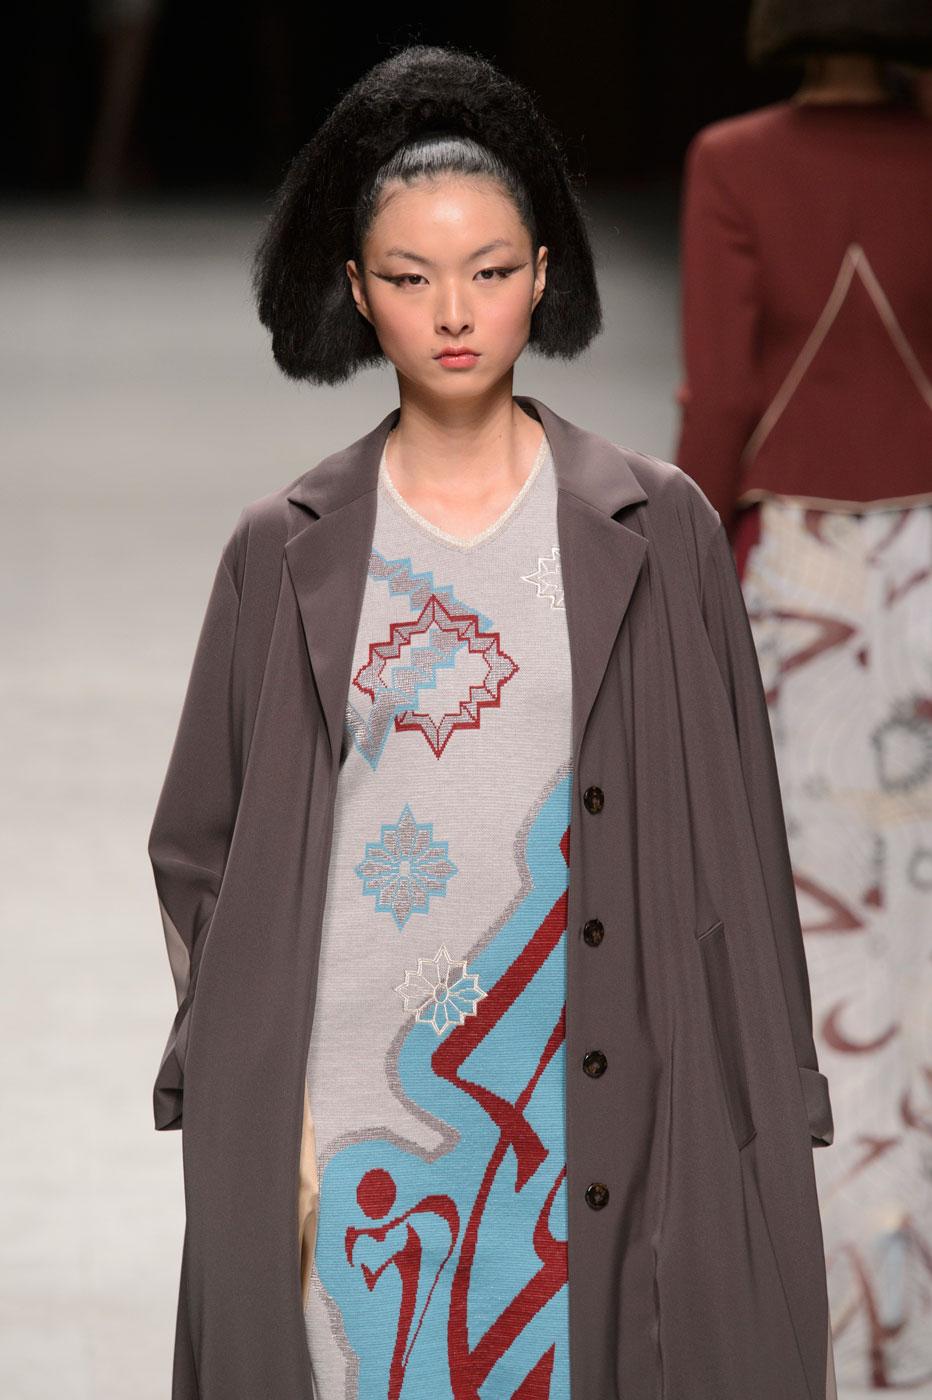 Julien-Fournie-Prive-fashion-runway-show-haute-couture-paris-spring-2015-the-impression-13